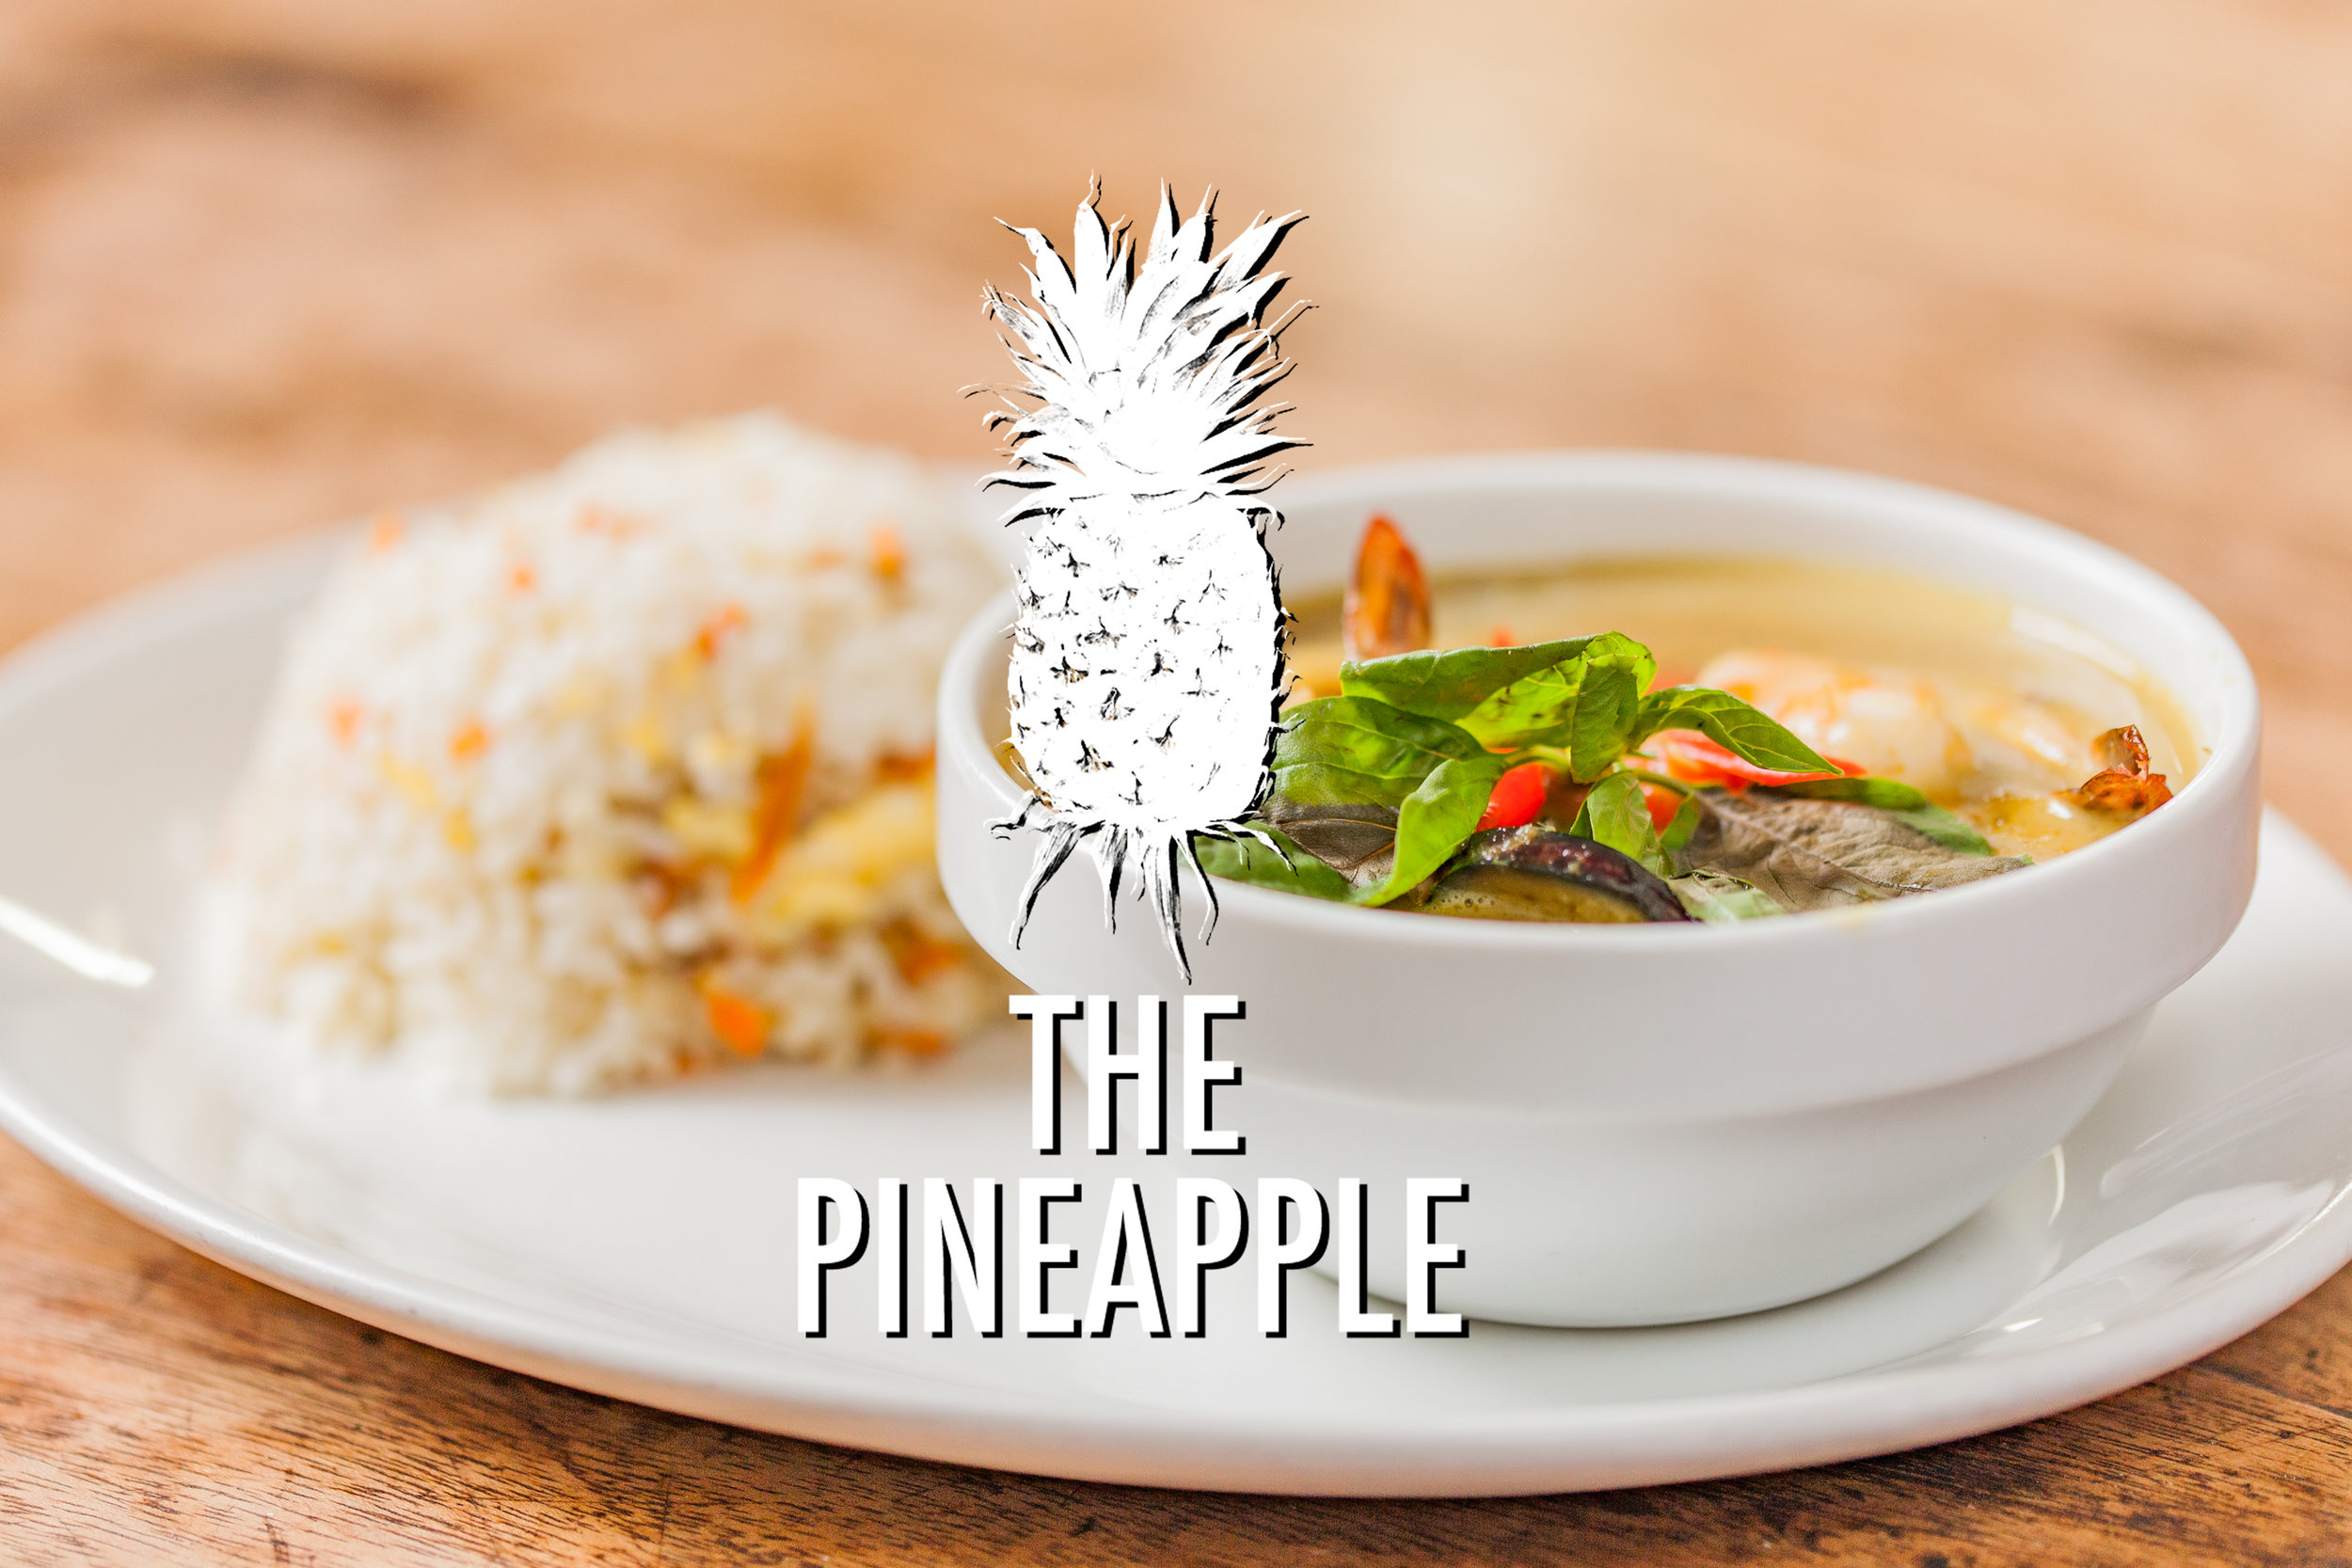 PineappleFoodFP.jpg